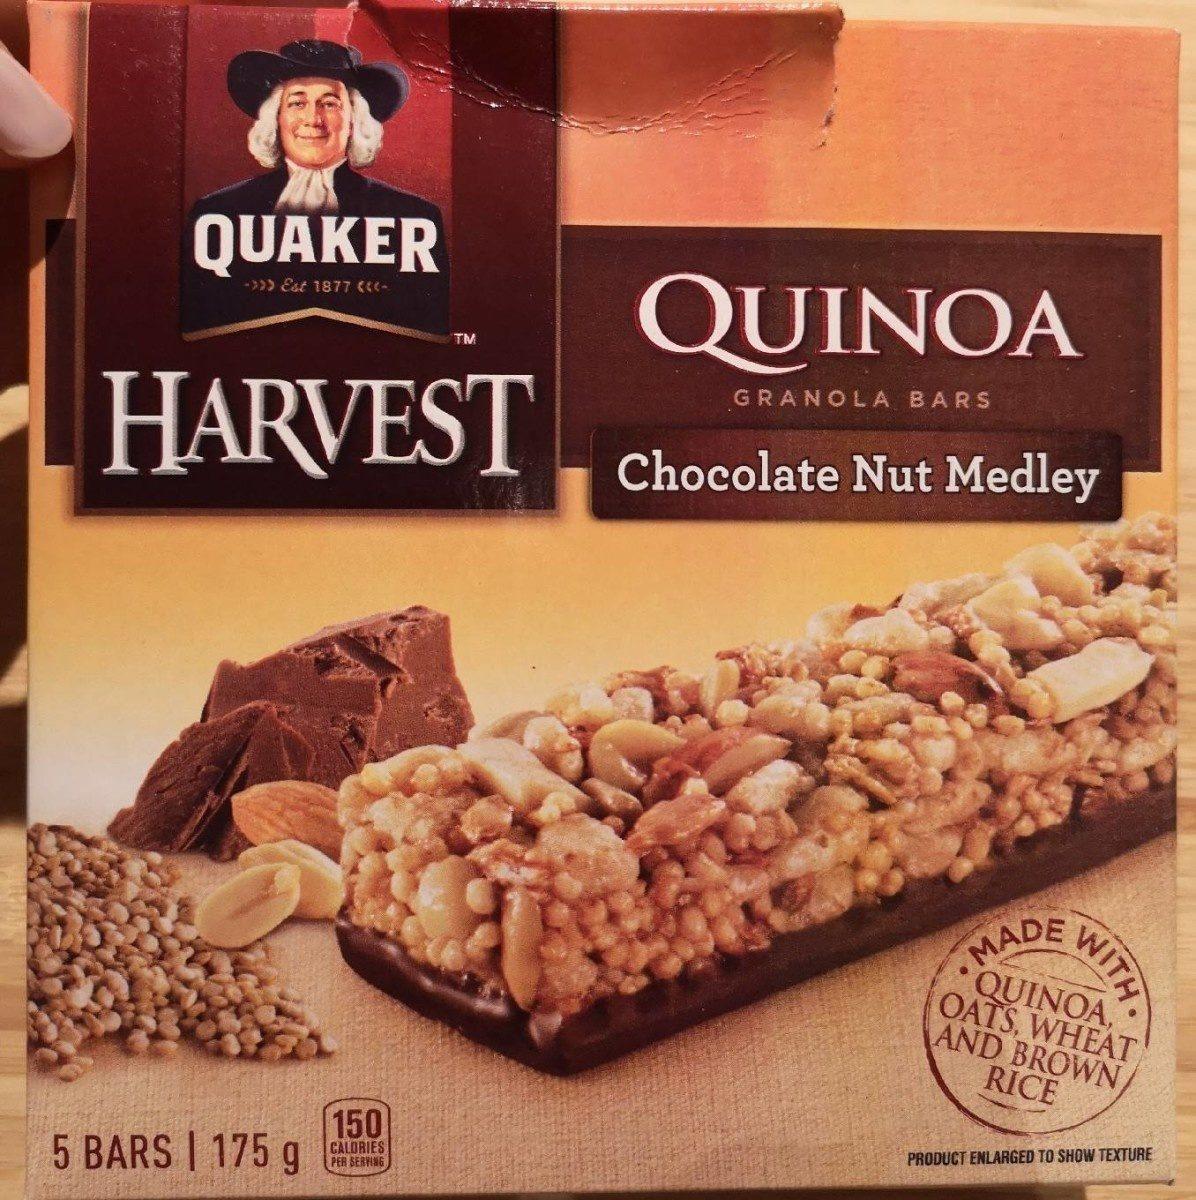 Quinoa Granola Bars Chocolate Nut Medley - Product